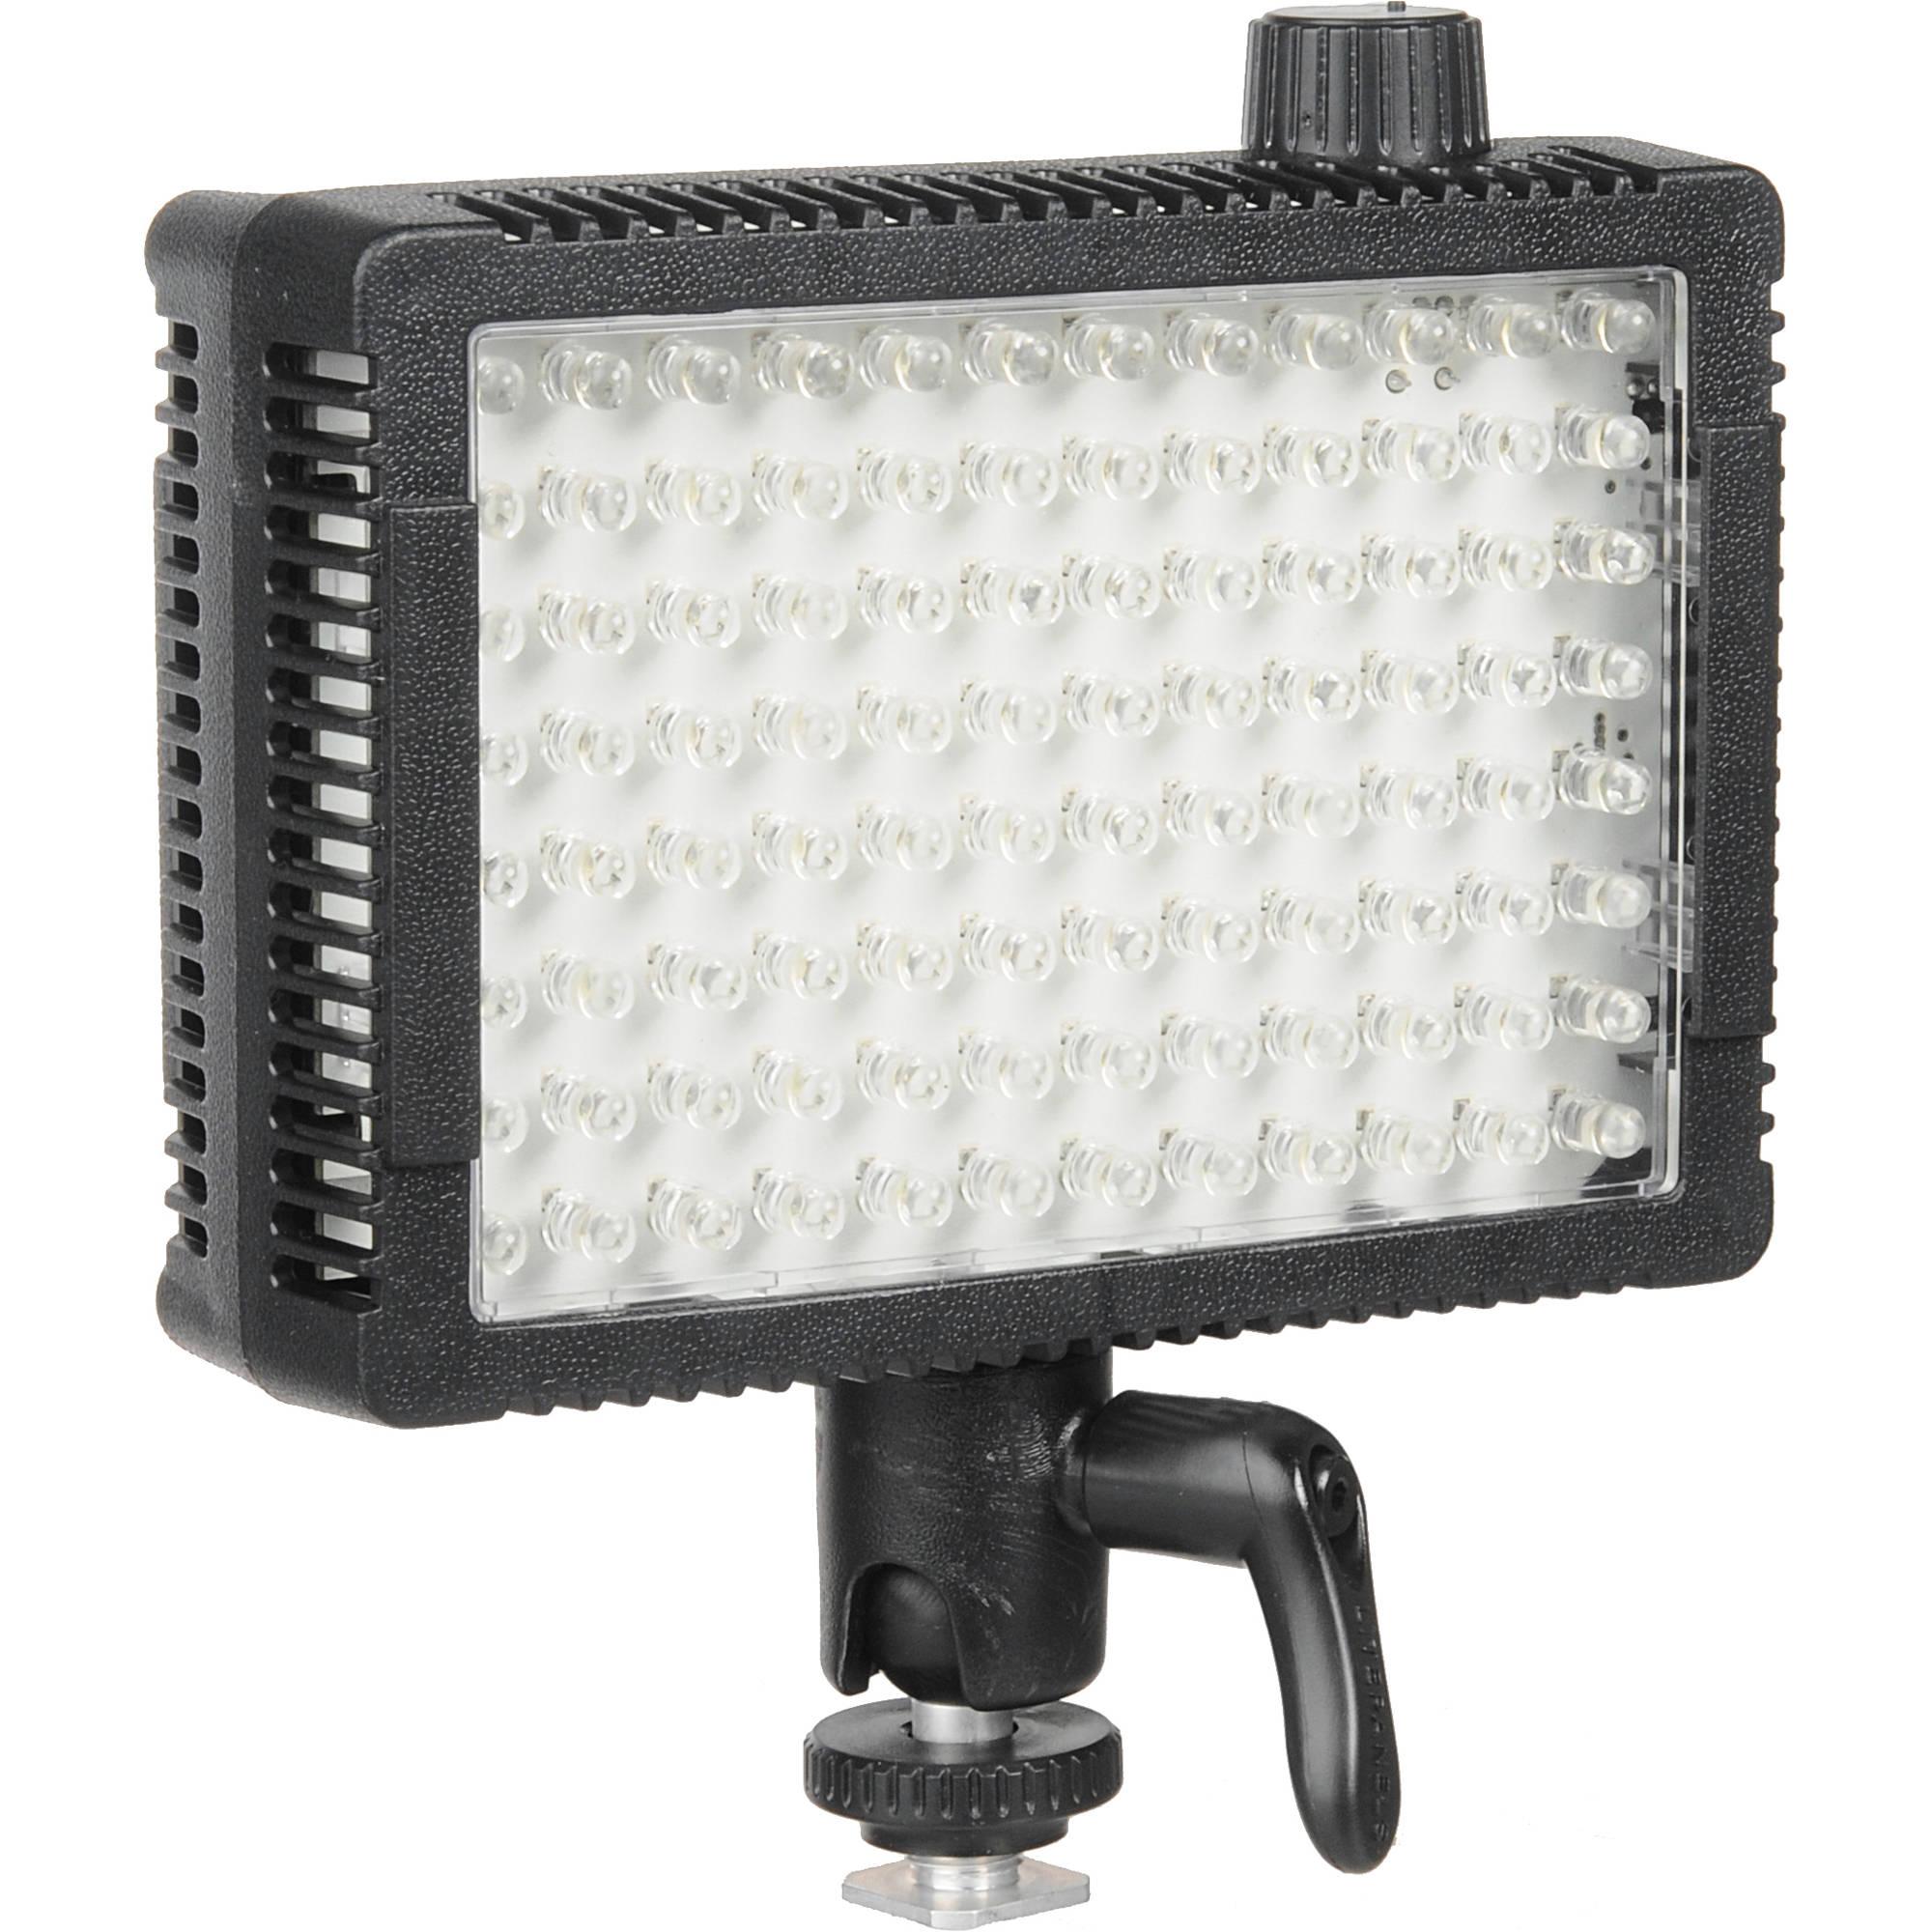 Litepanels Micropro Led On Camera Light 905 2002 B Amp H Photo